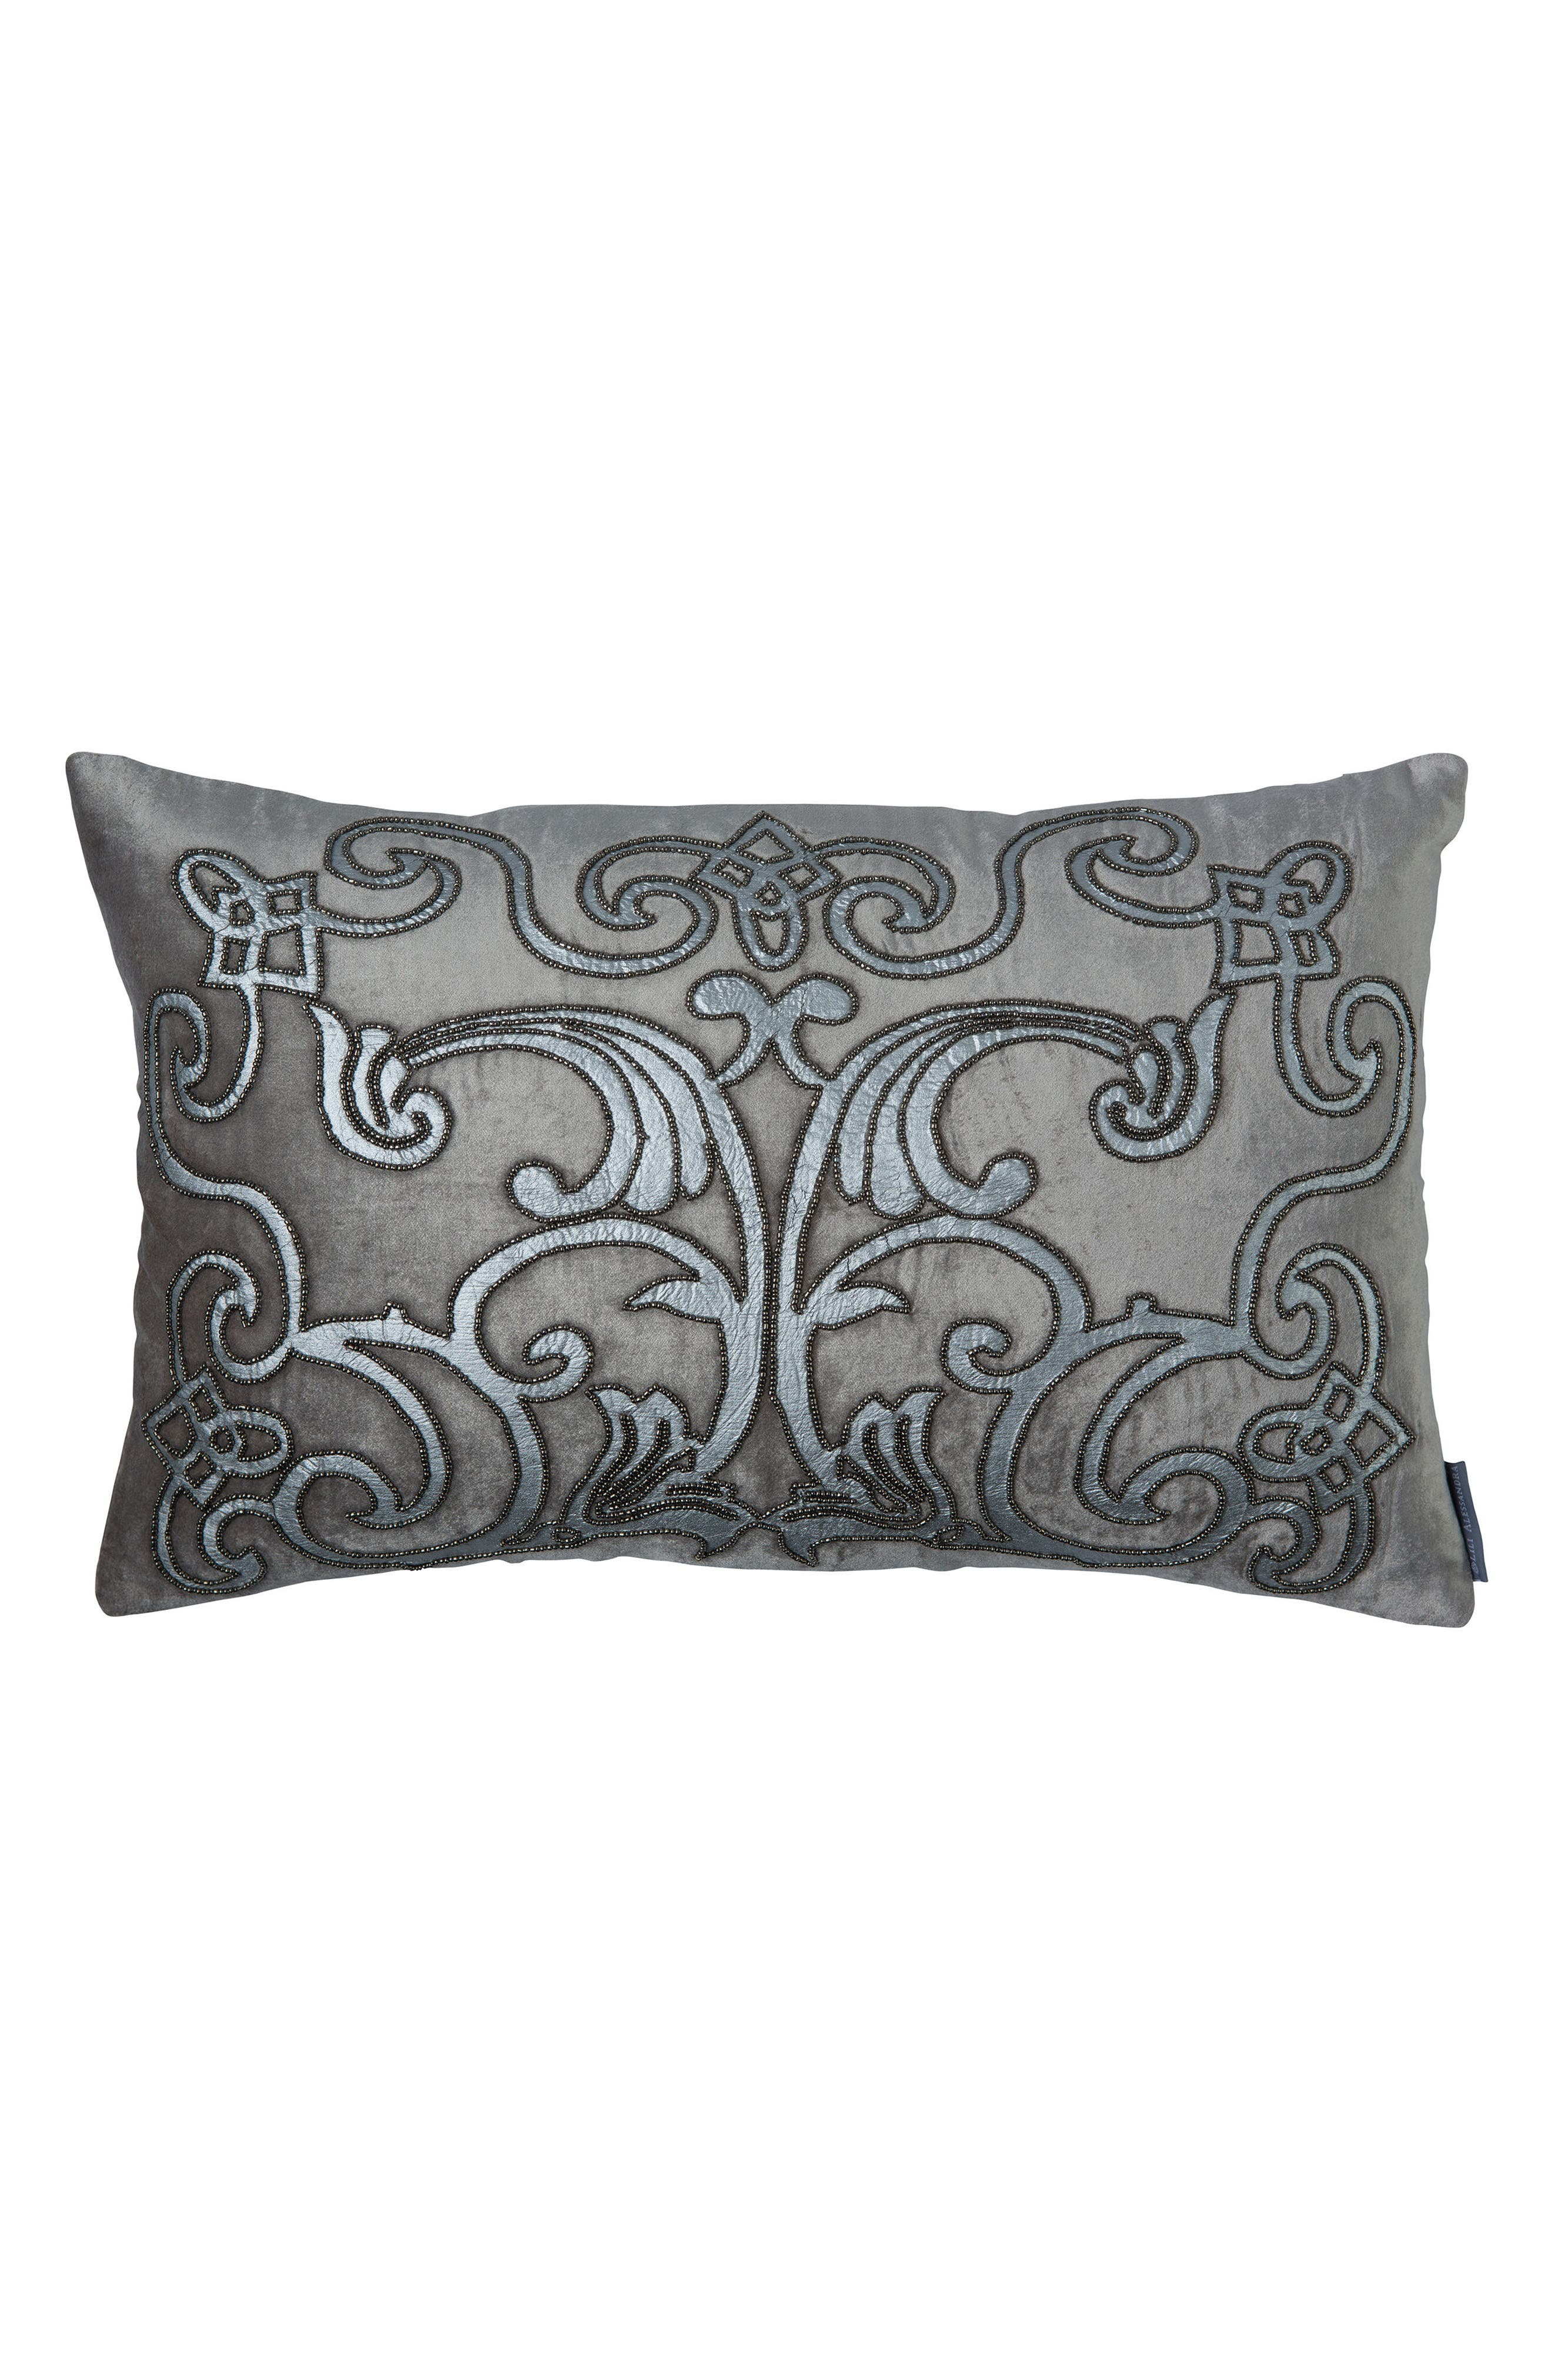 Alternate Image 1 Selected - Lili Alessandra Mozart Rectangular Accent Pillow